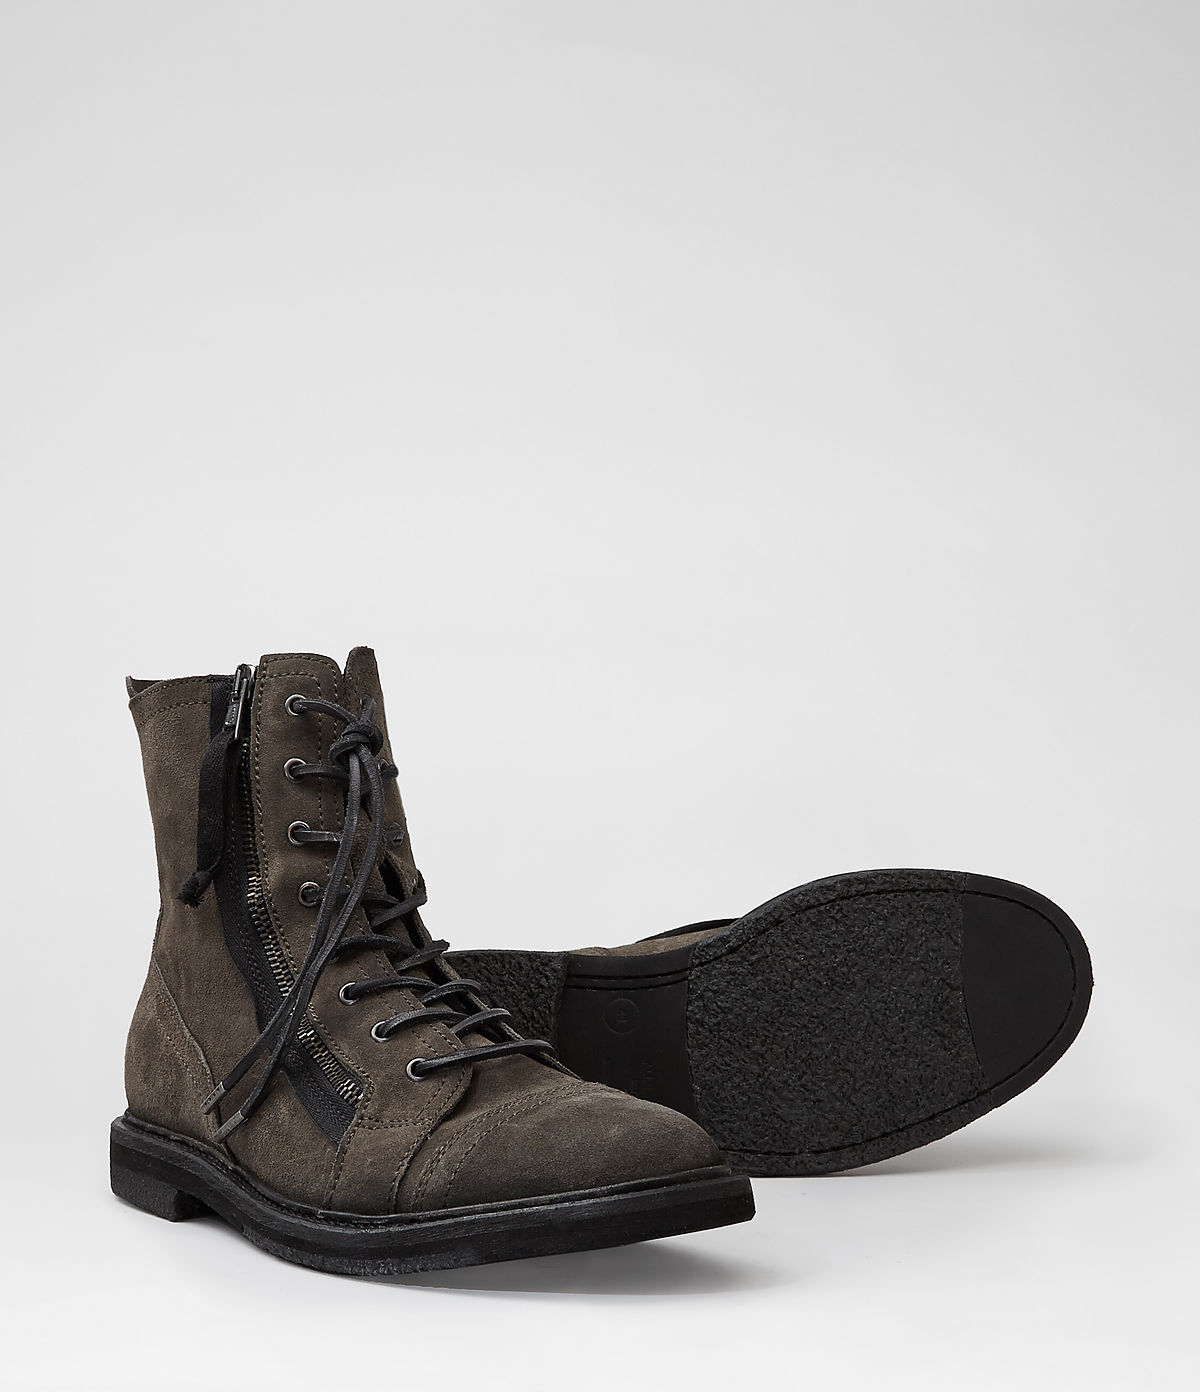 b1176d05b56 AllSaints Rutledge Boot in Green for Men - Lyst